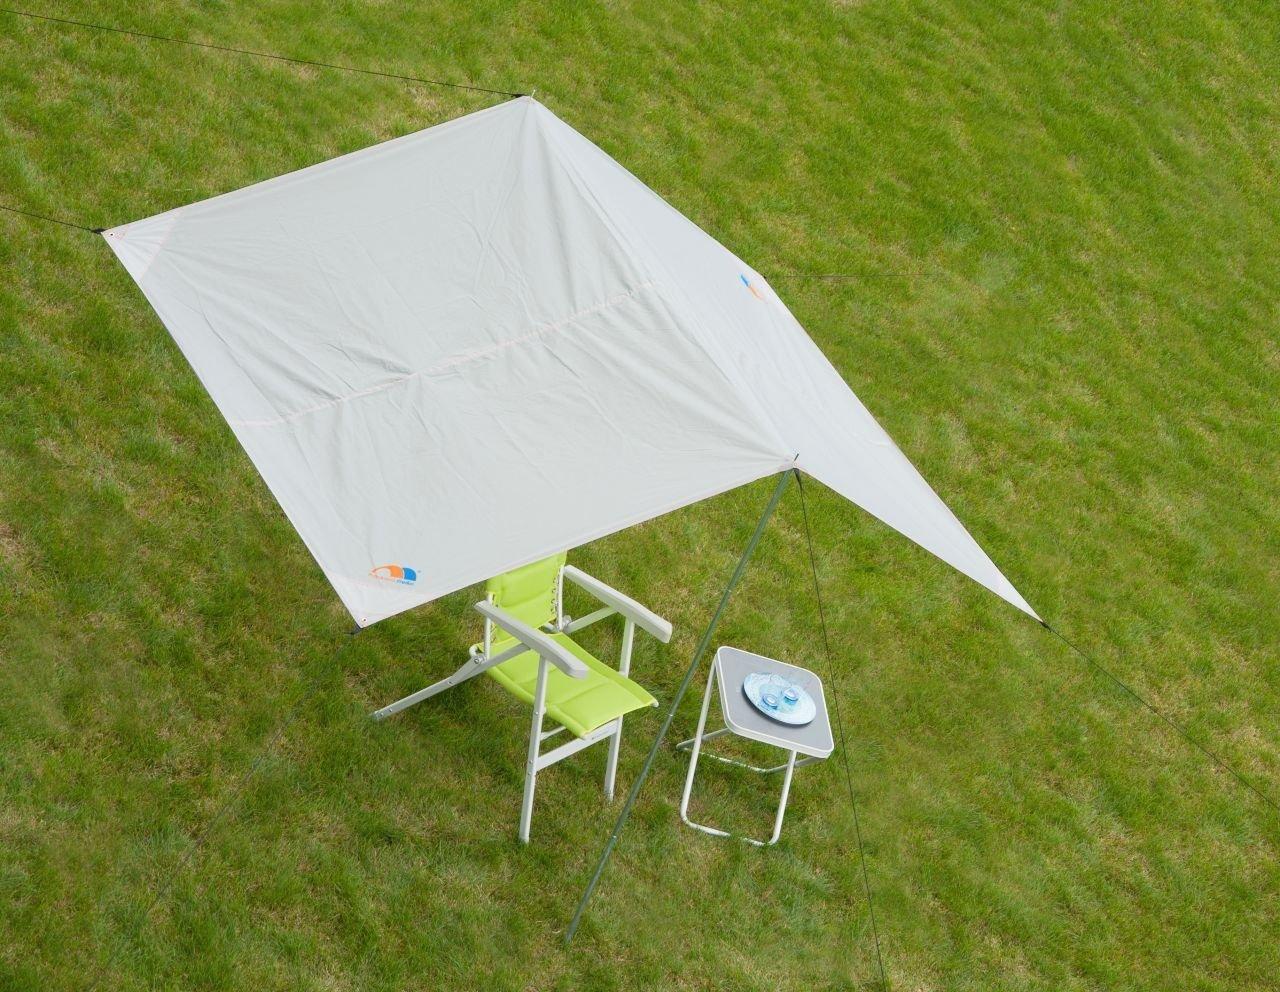 Frankana Plane Basic Sun Shelter Sail & Polen Camping Caravan hellgrau 4 x 5 m